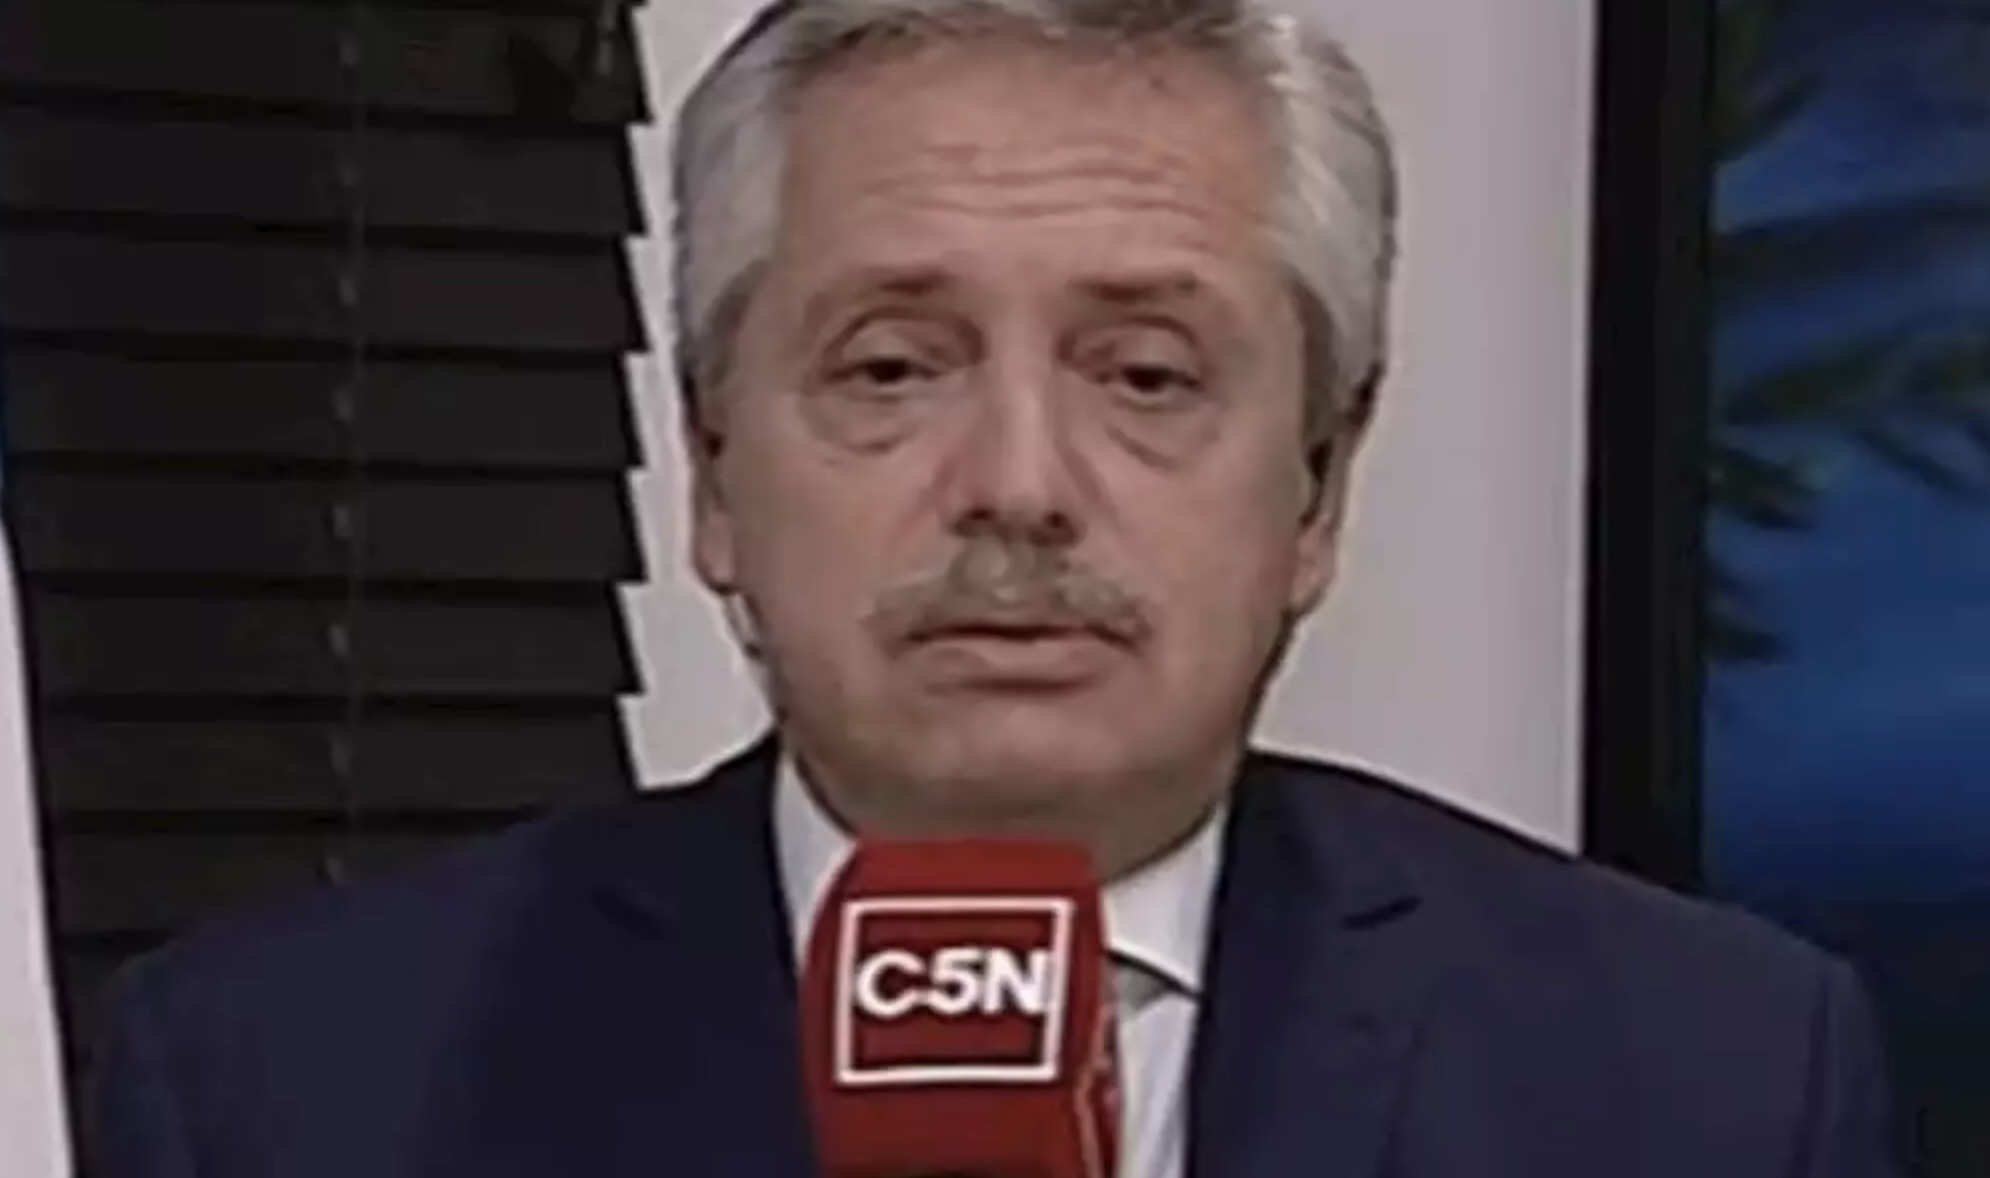 Alberto Angel Fernández